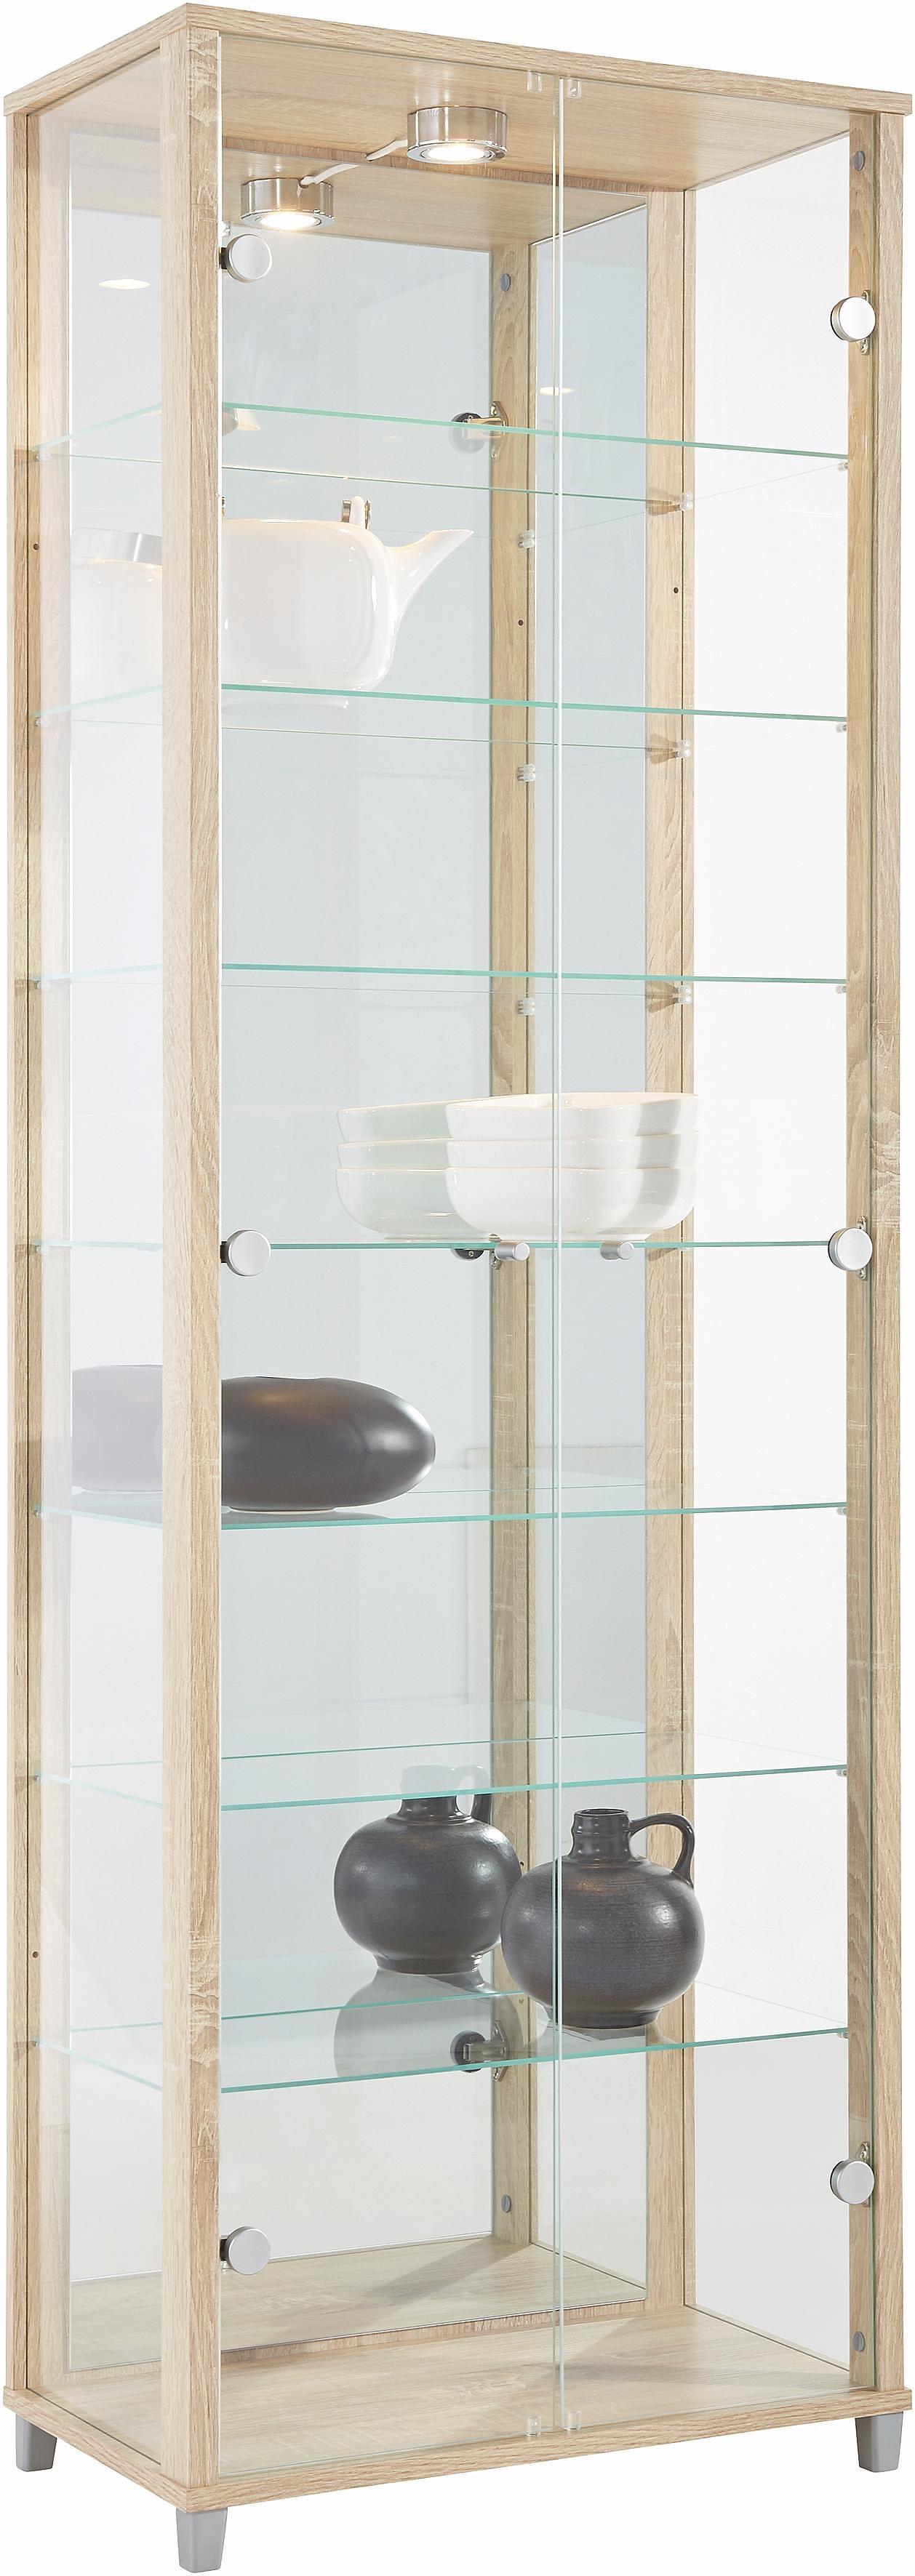 Grote Glazen Vitrinekast.Vitrinekast Met Spiegelachterwand 7 Glasplateaus